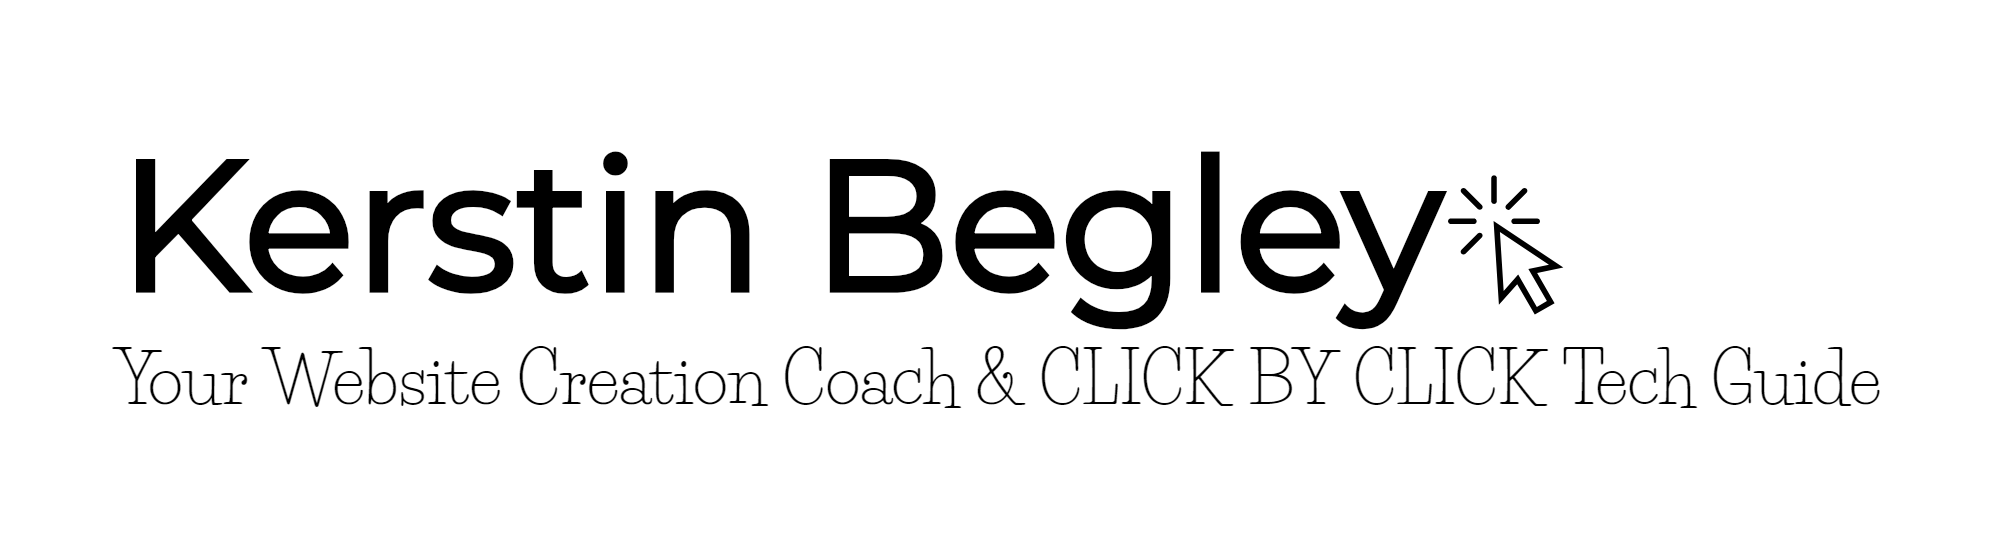 Kerstin Begley-logo-black.png